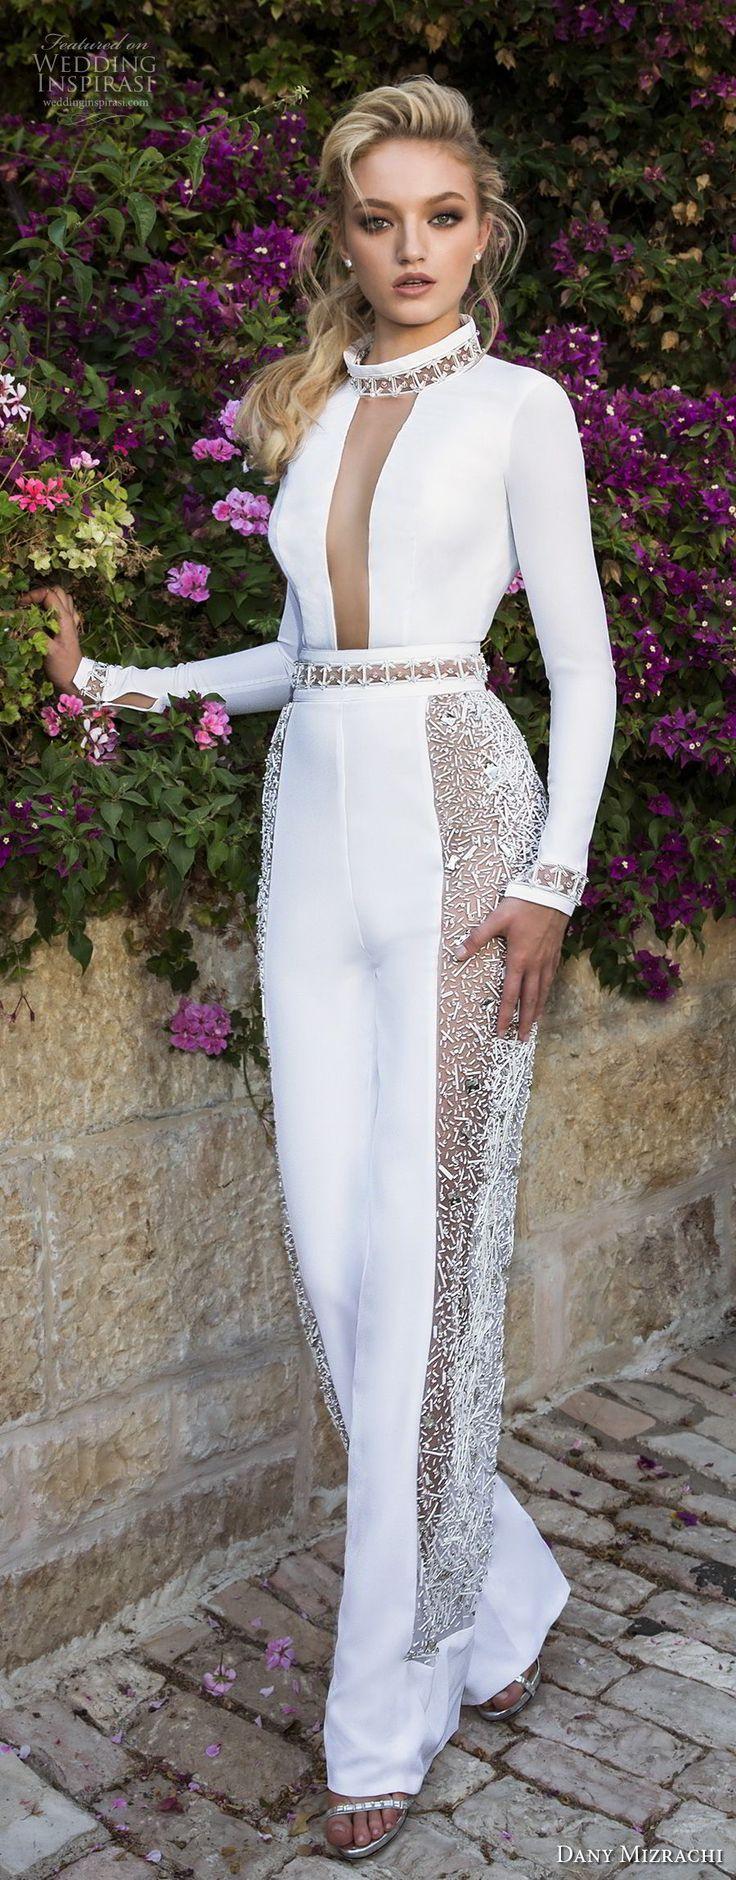 dany mizrachi spring 2018 bridal long sleevess high neck keyhole bodice simple chic jumpsuit wedding dress keyhole back (37) mv -- Dany Mizrachi Spring 2018 Wedding Dresses